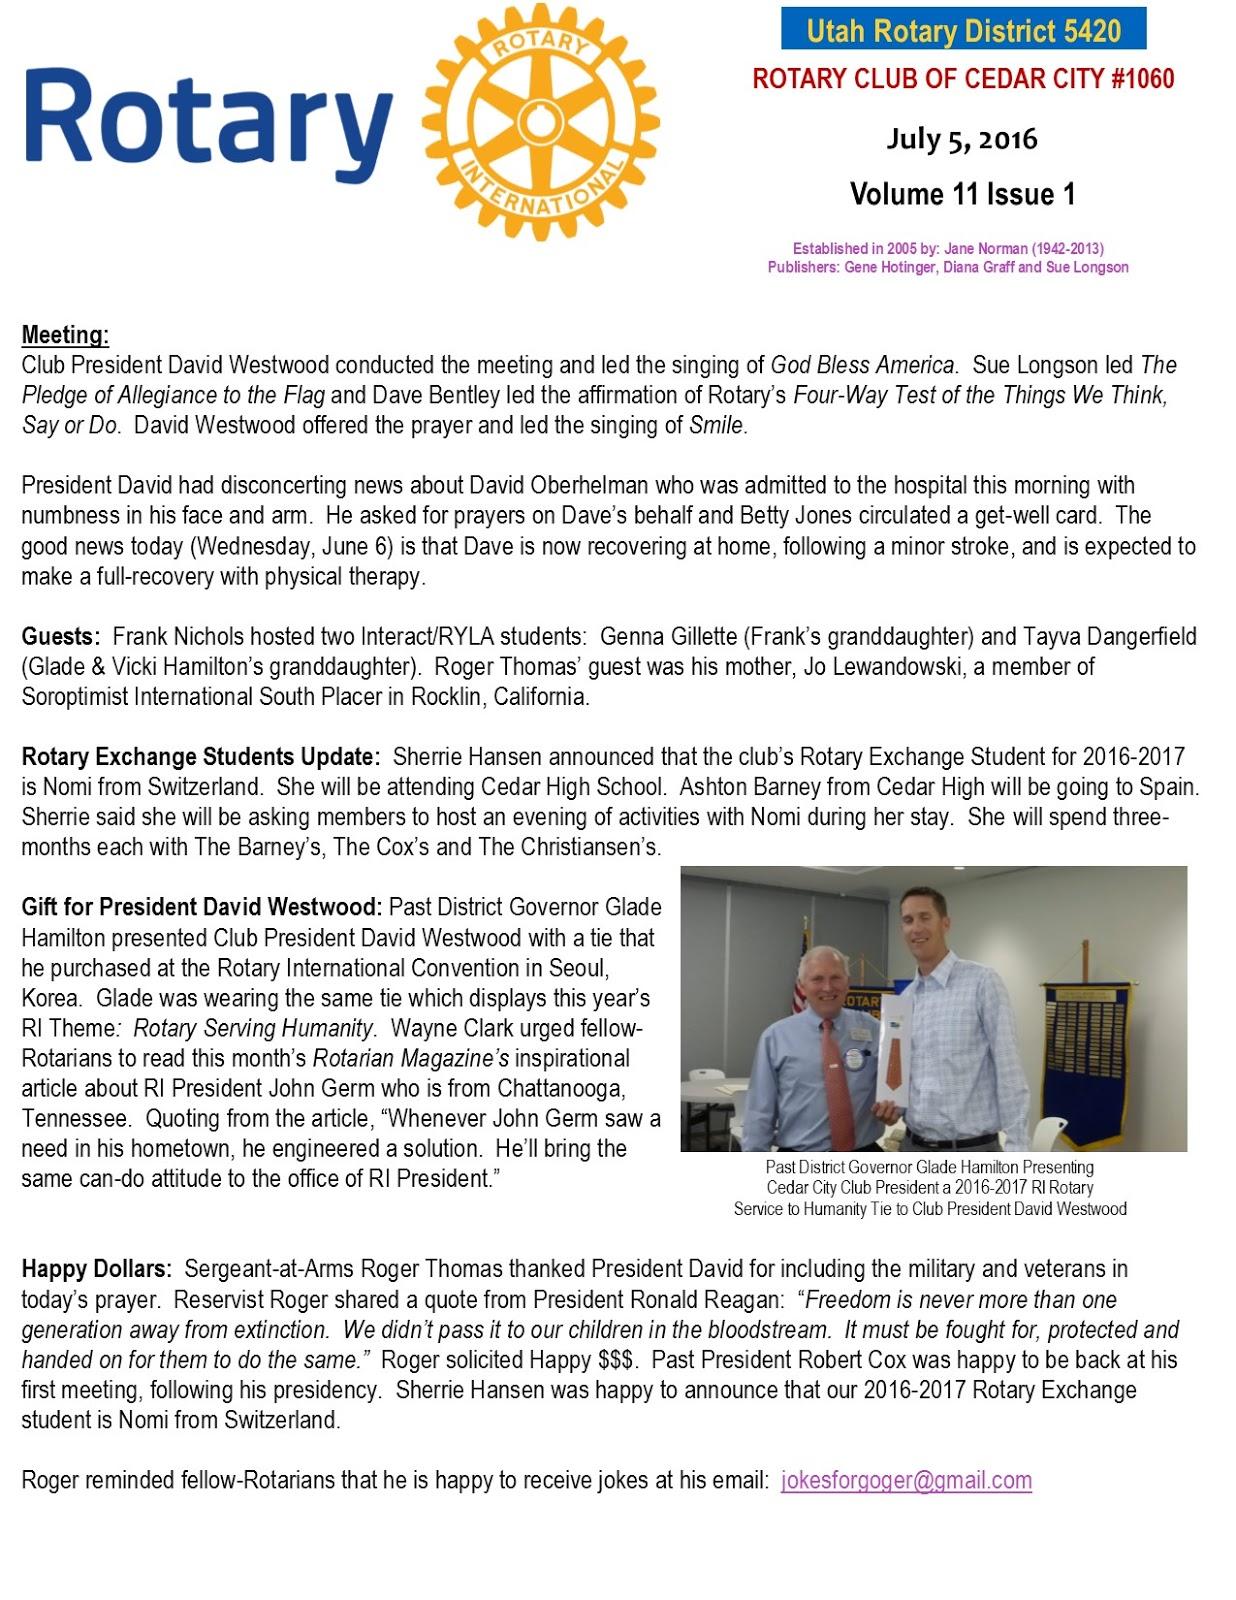 Cedar City Rotary Club service above self humanitarian